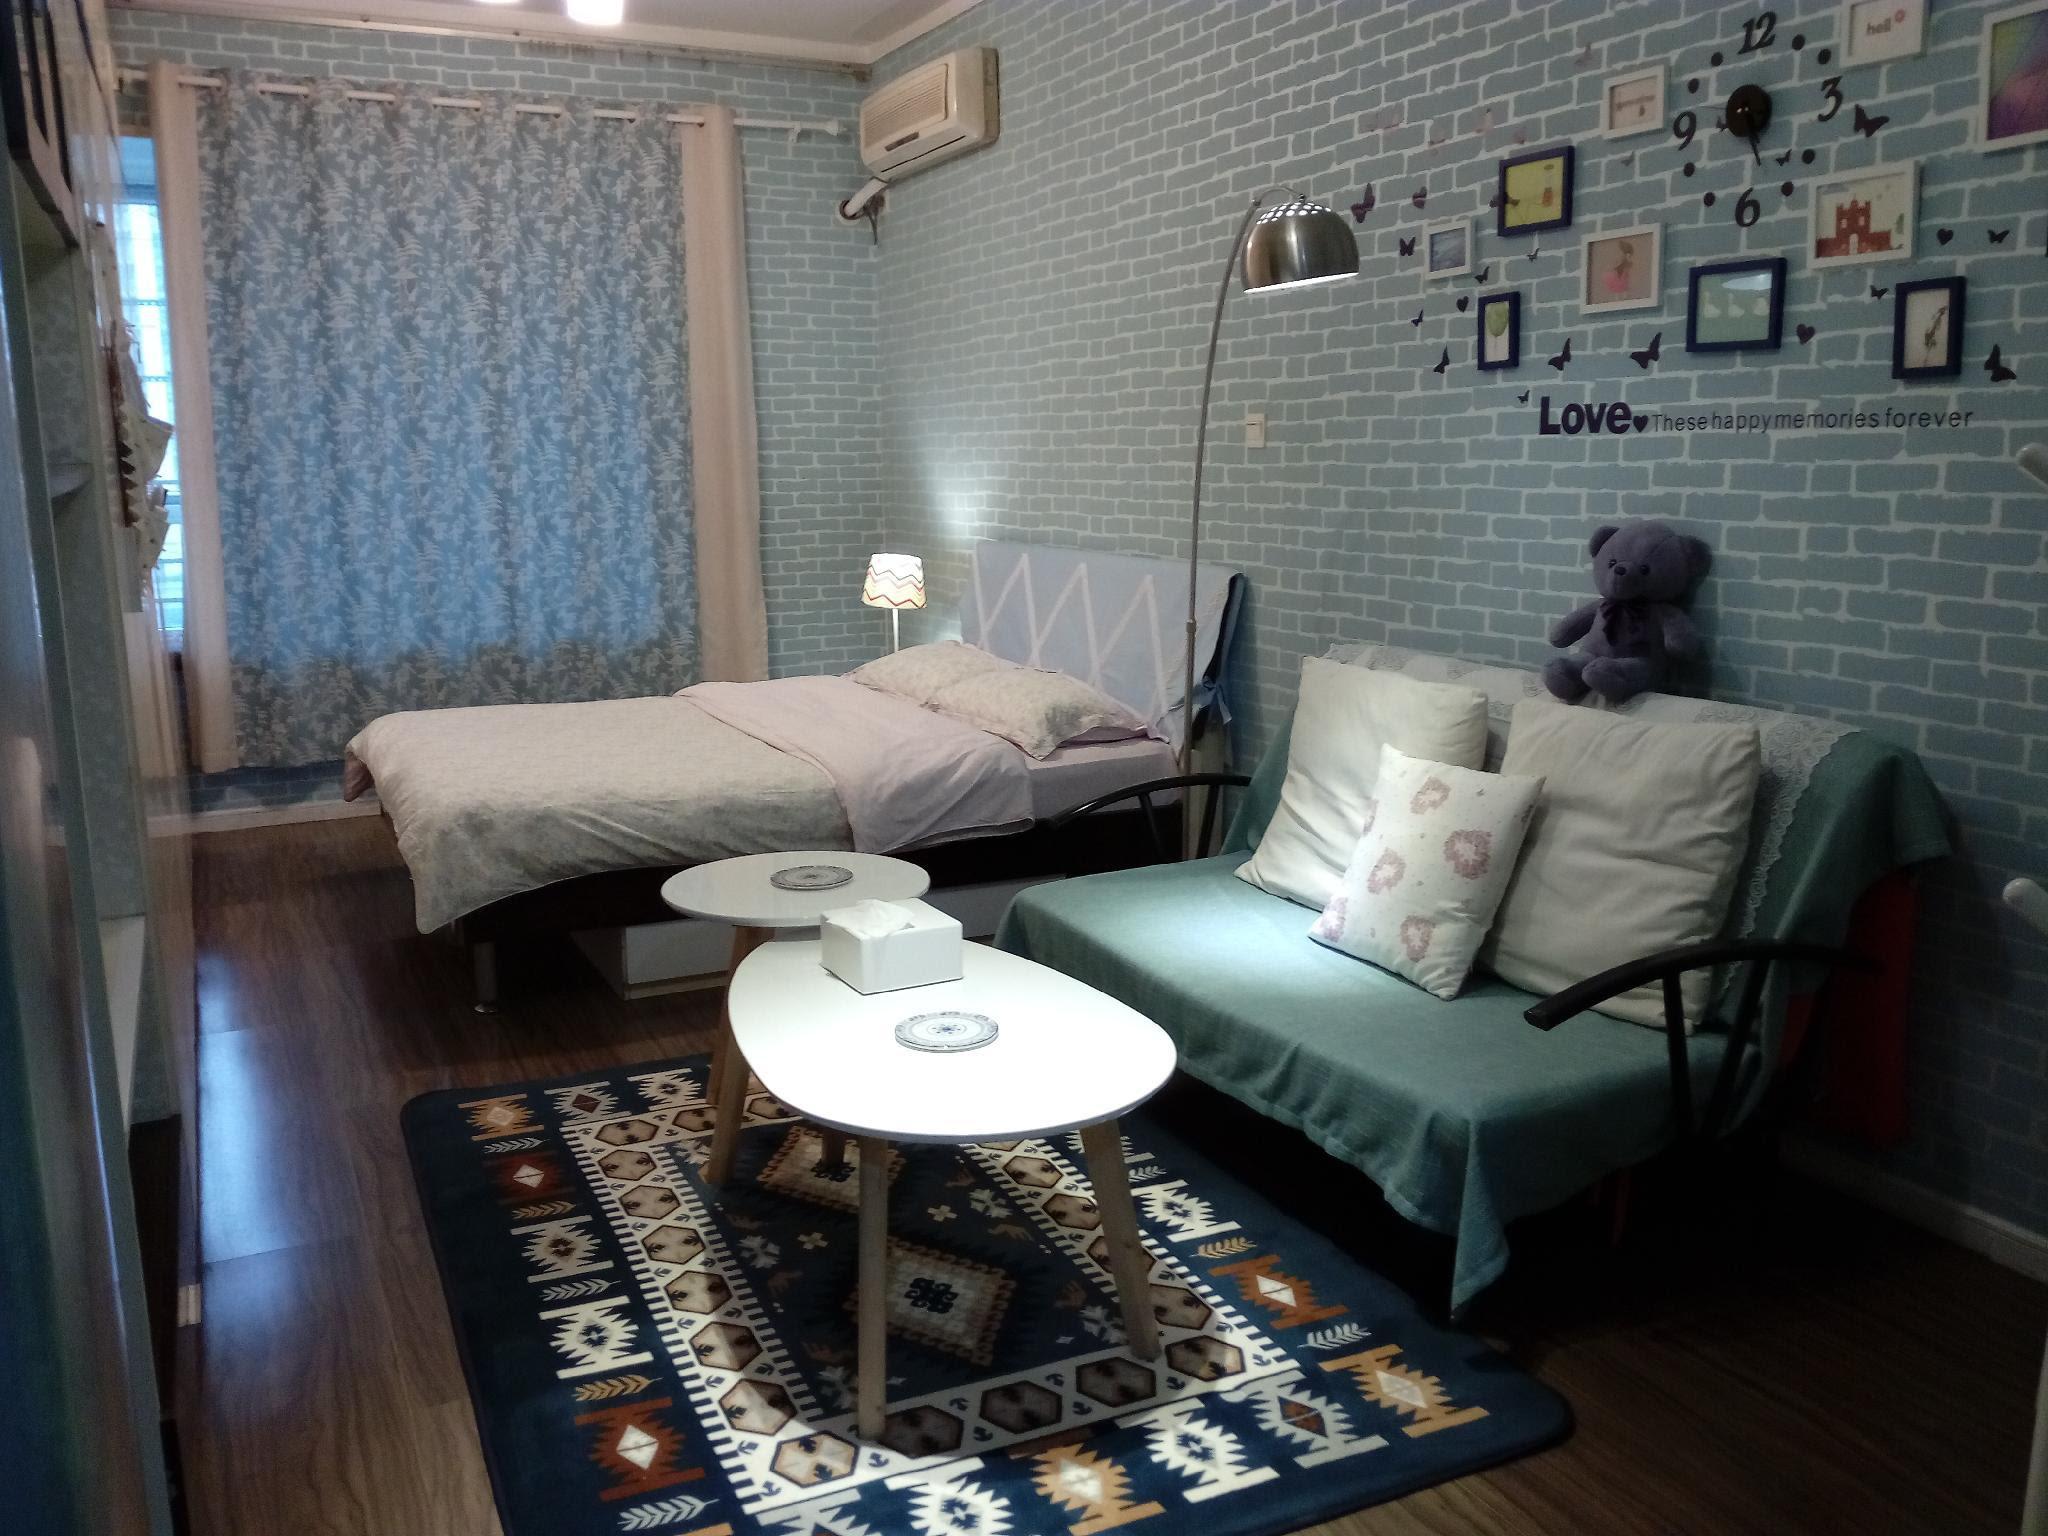 Chongqing Sunroom Hotel Apartment Reviews